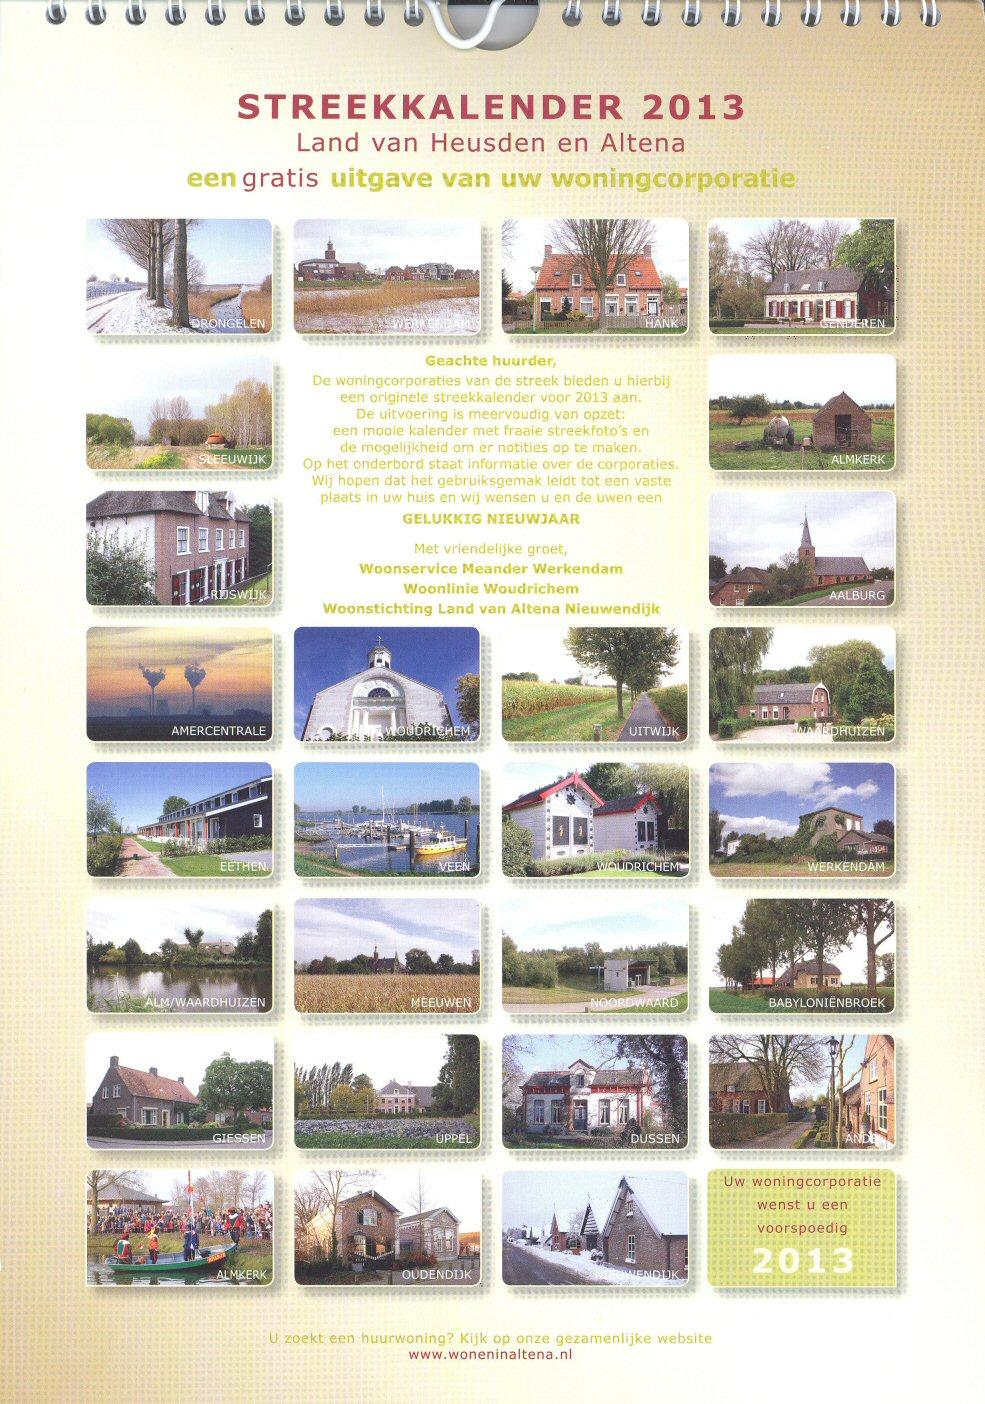 Kalender 003a - streekkalender 2013